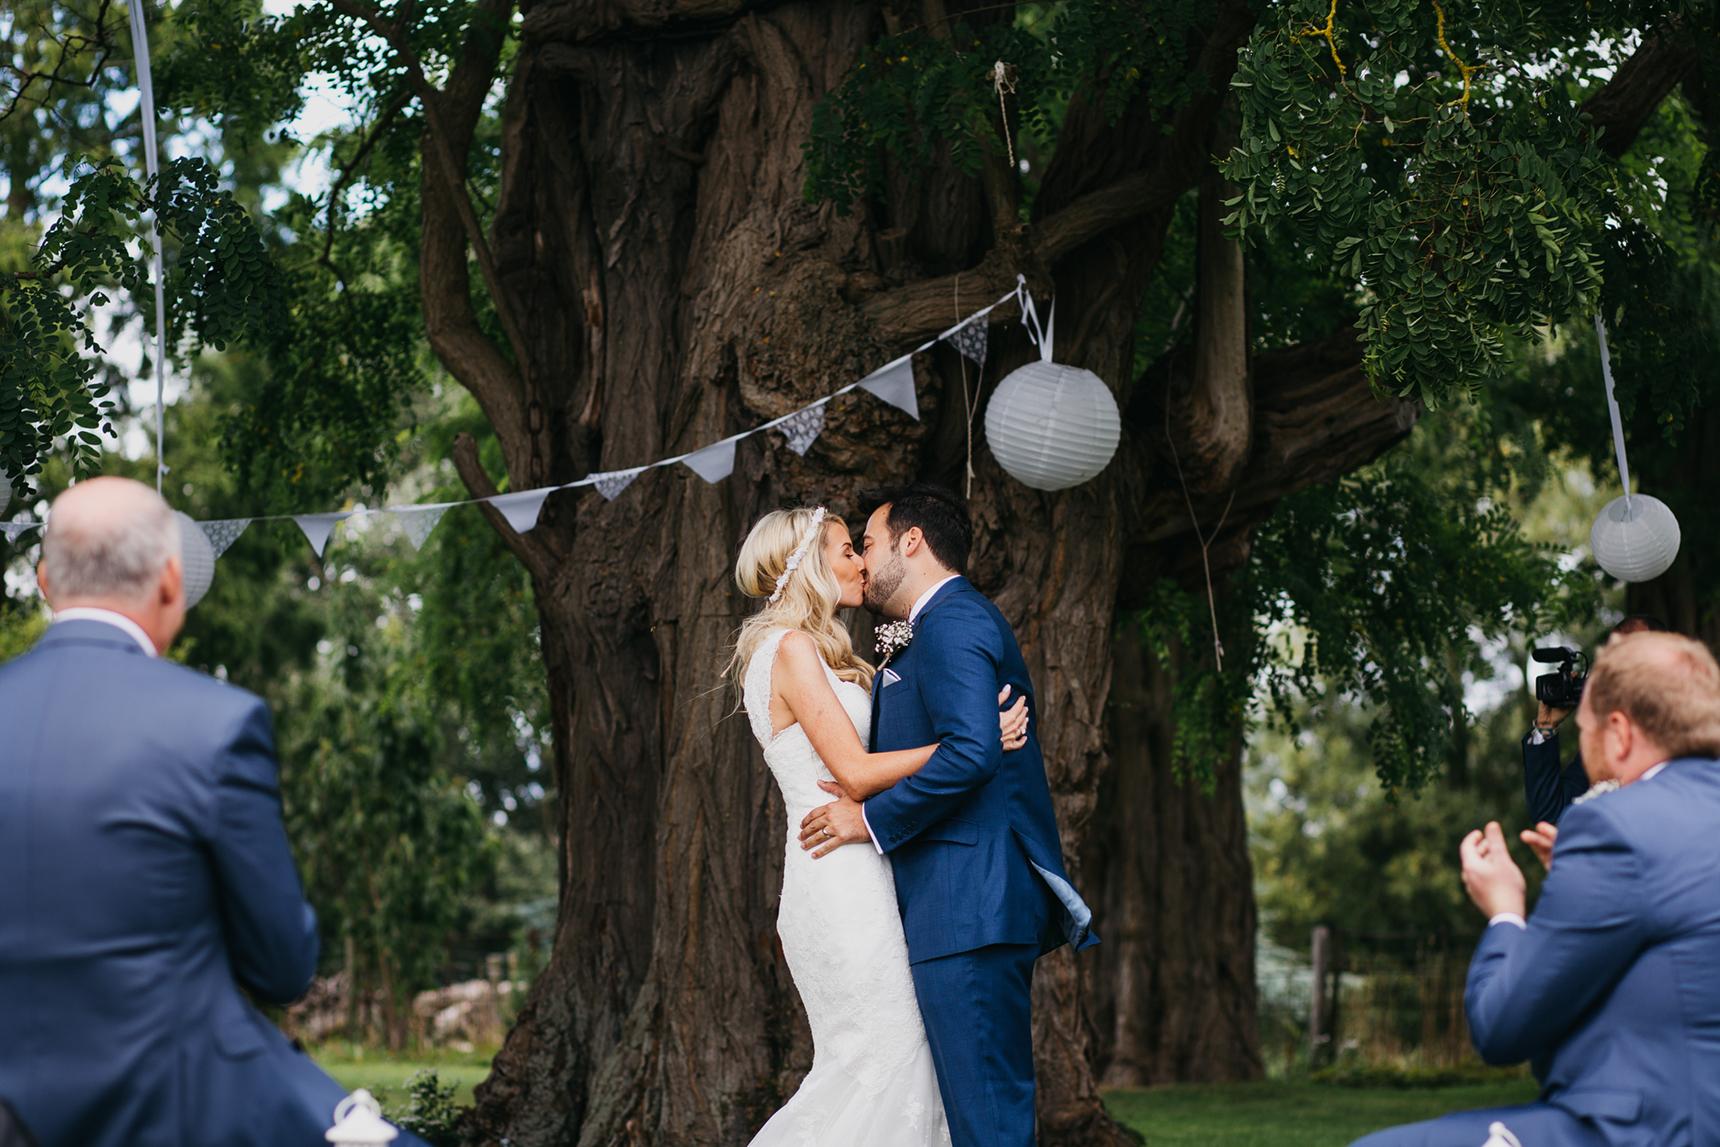 Stratford-upon-Avon wedding photos